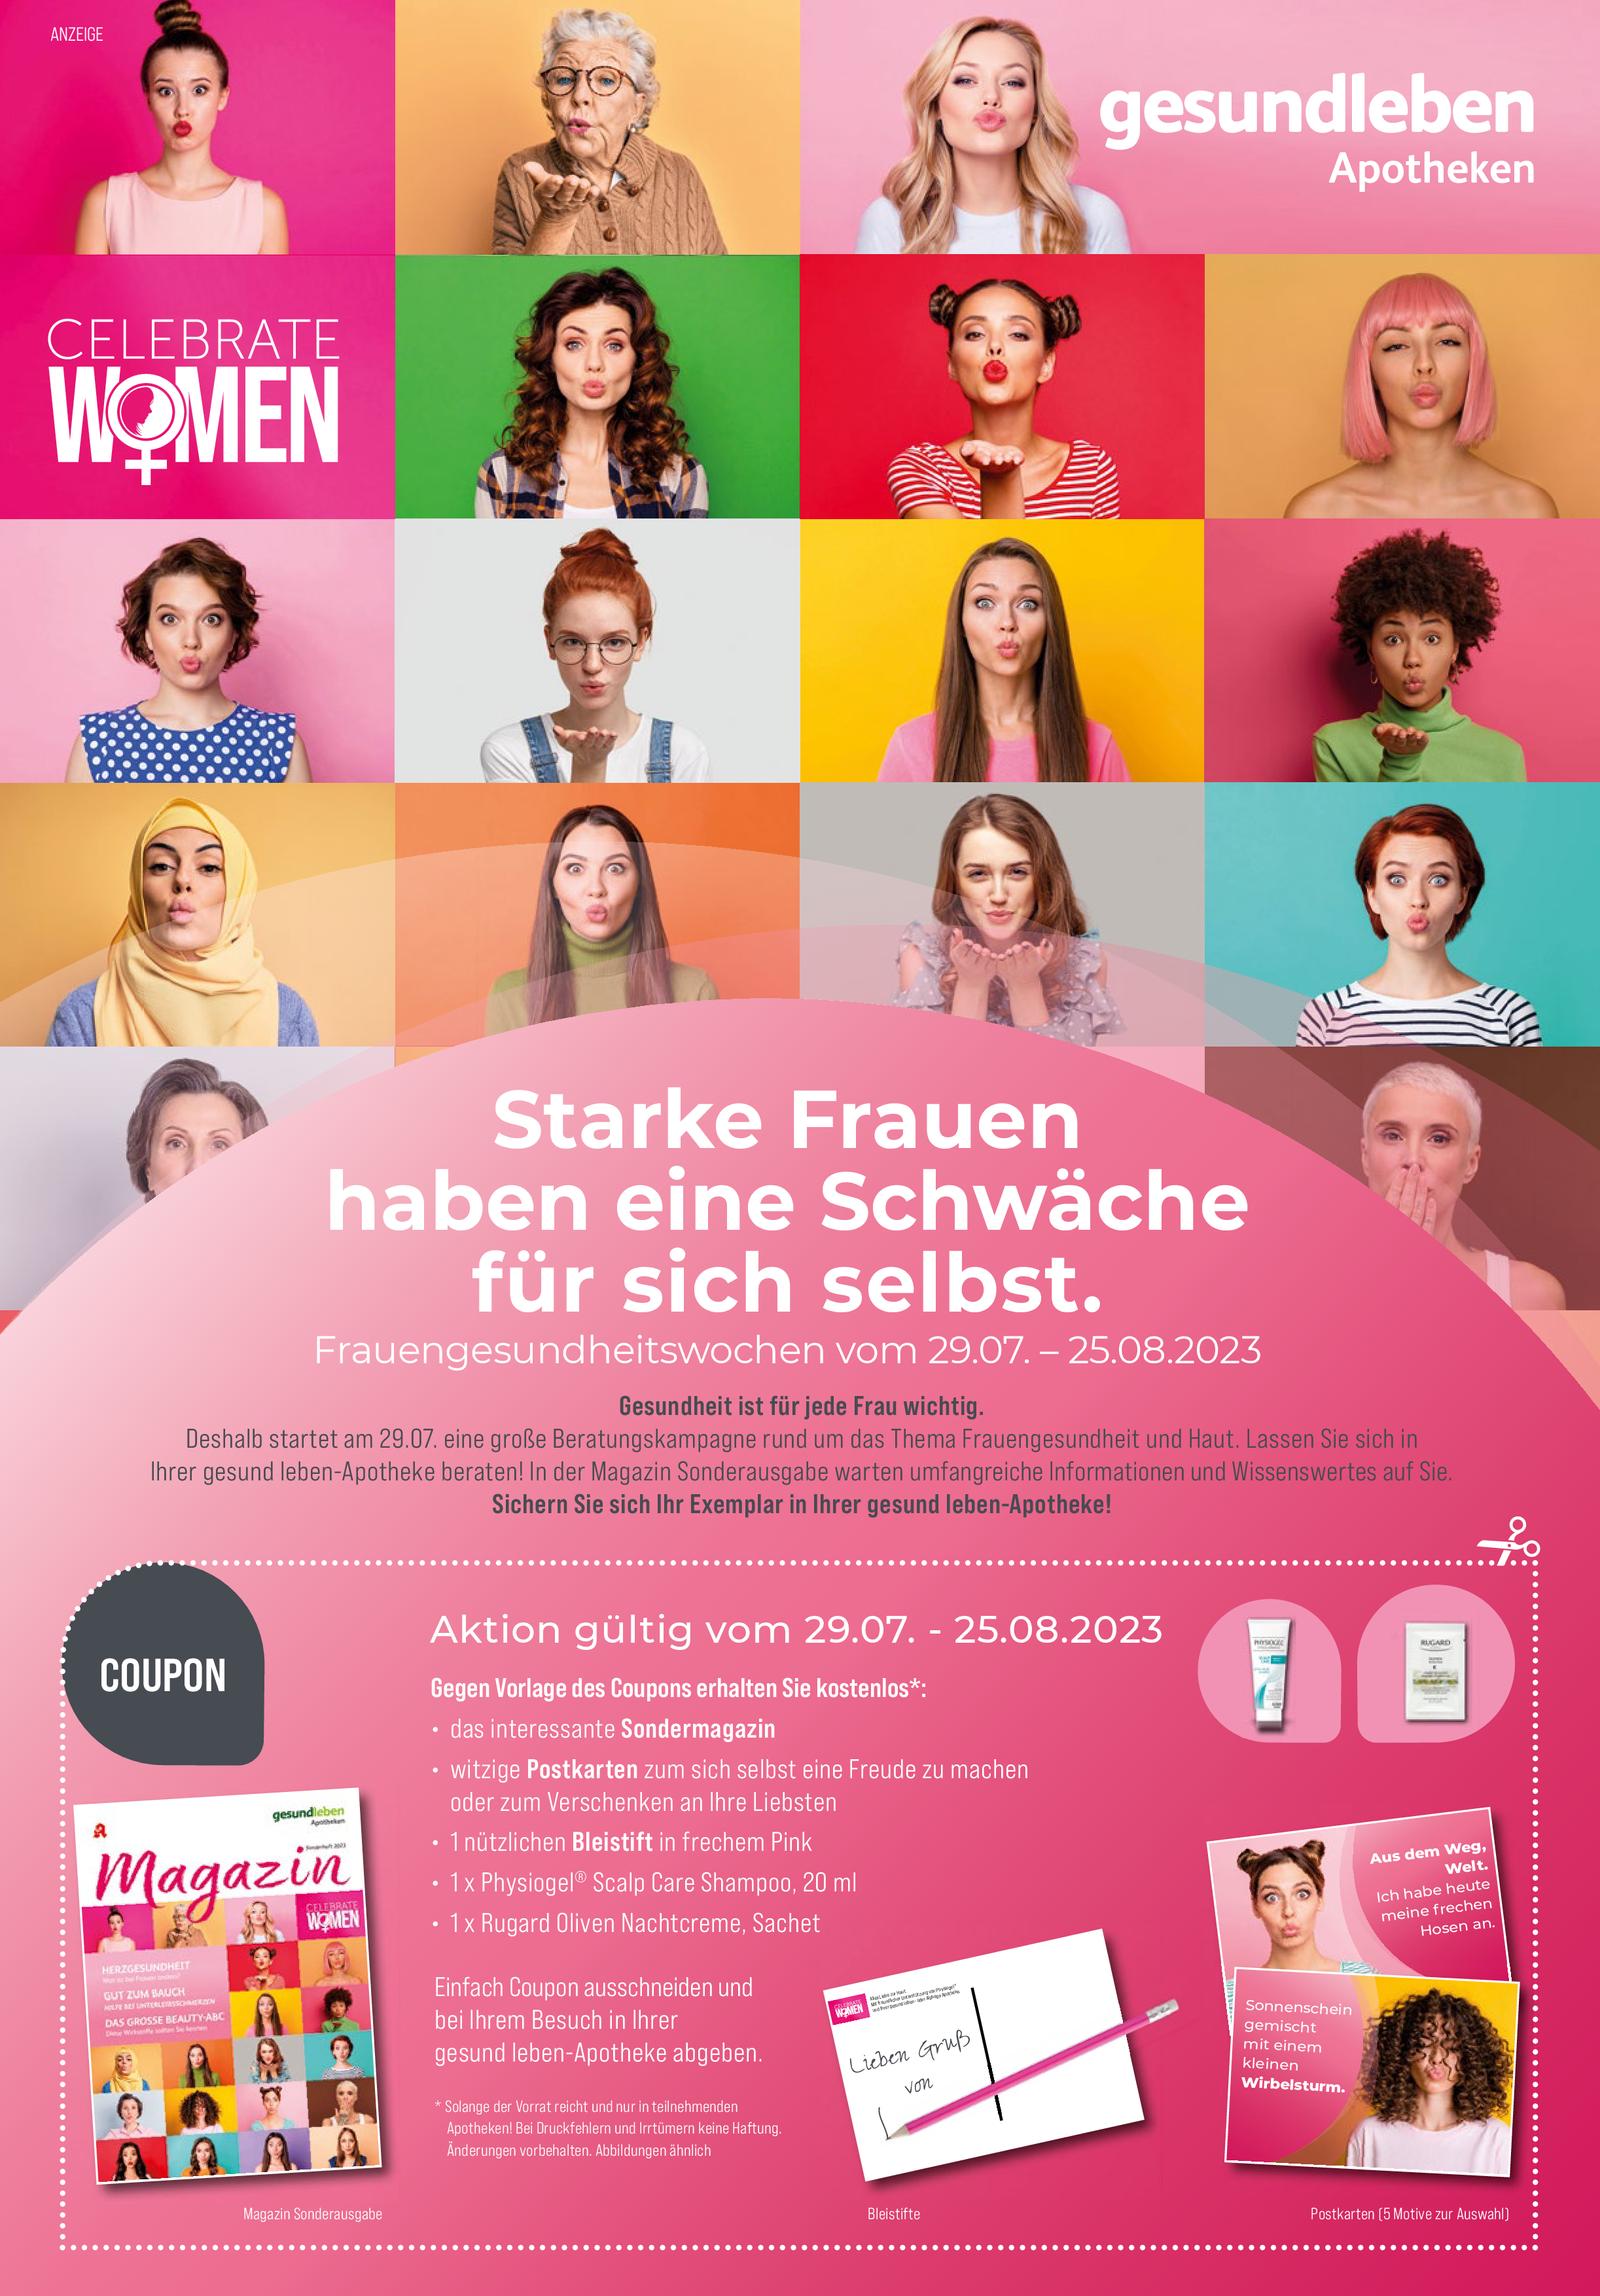 https://mein-uploads.apocdn.net/29205/leaflets/gesundleben_niedrig-Seite5.png